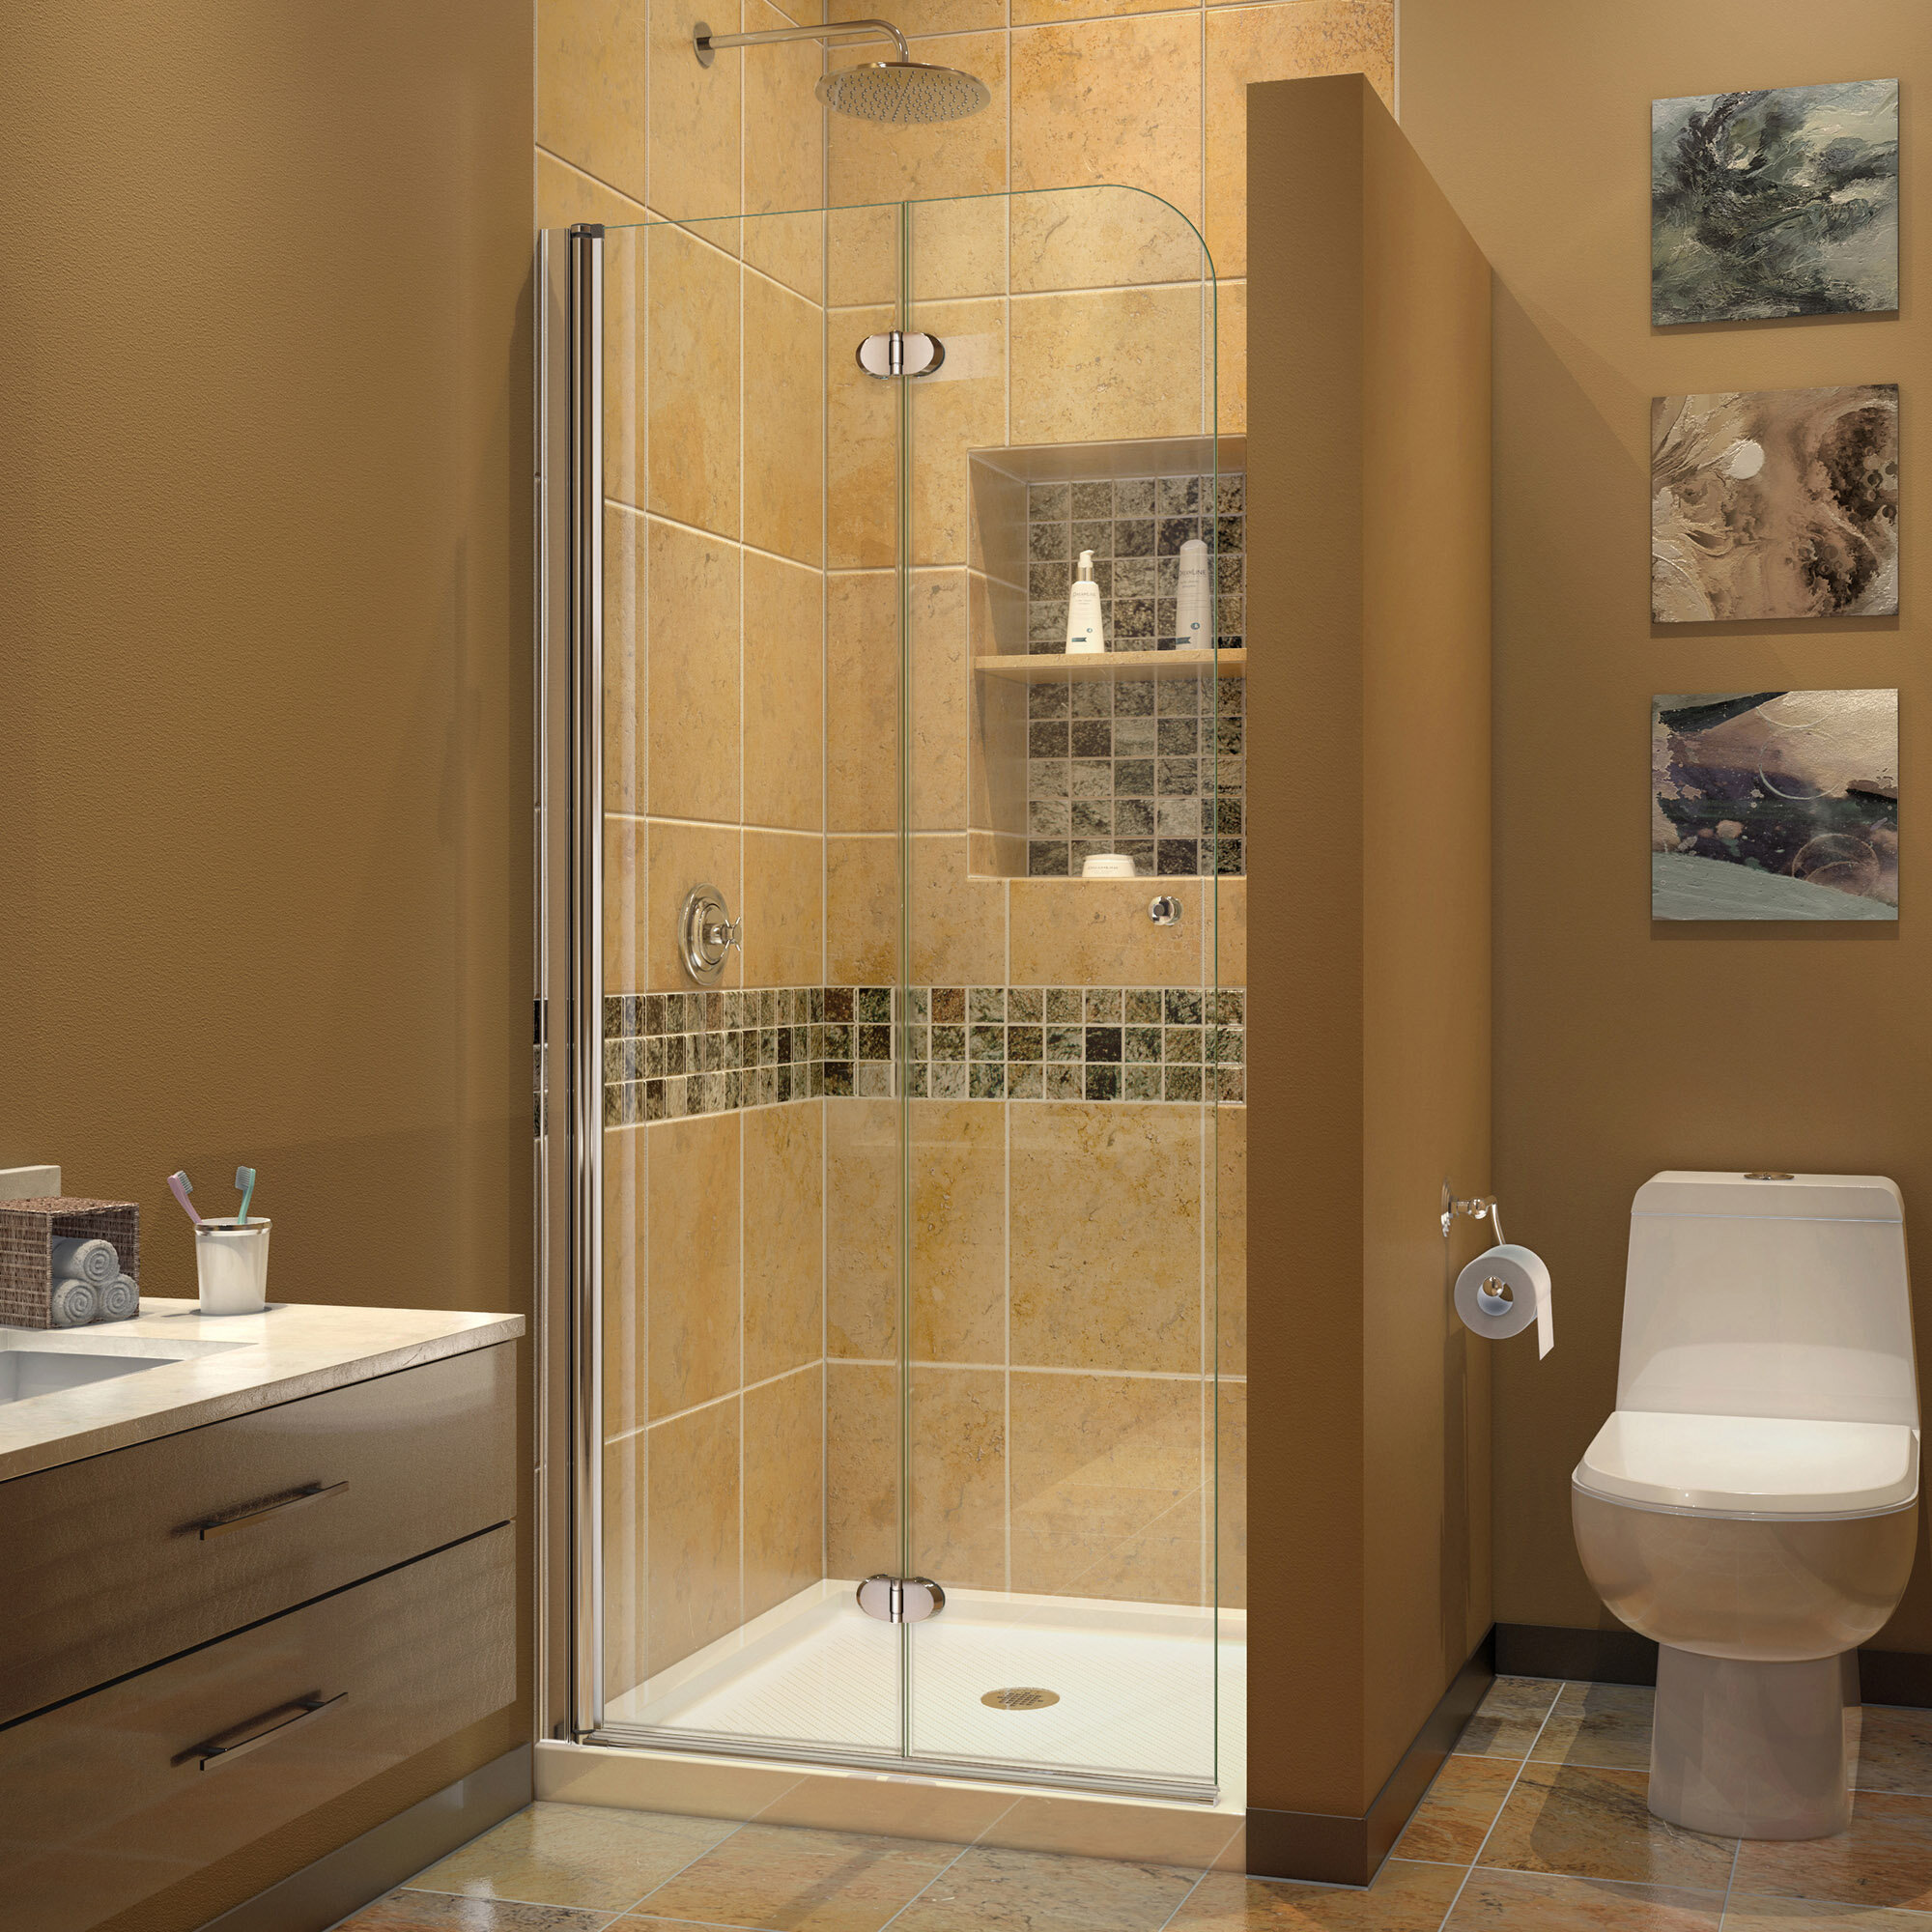 Dreamline Aqua Fold 335 X 72 Hinged Semi Frameless Shower Door